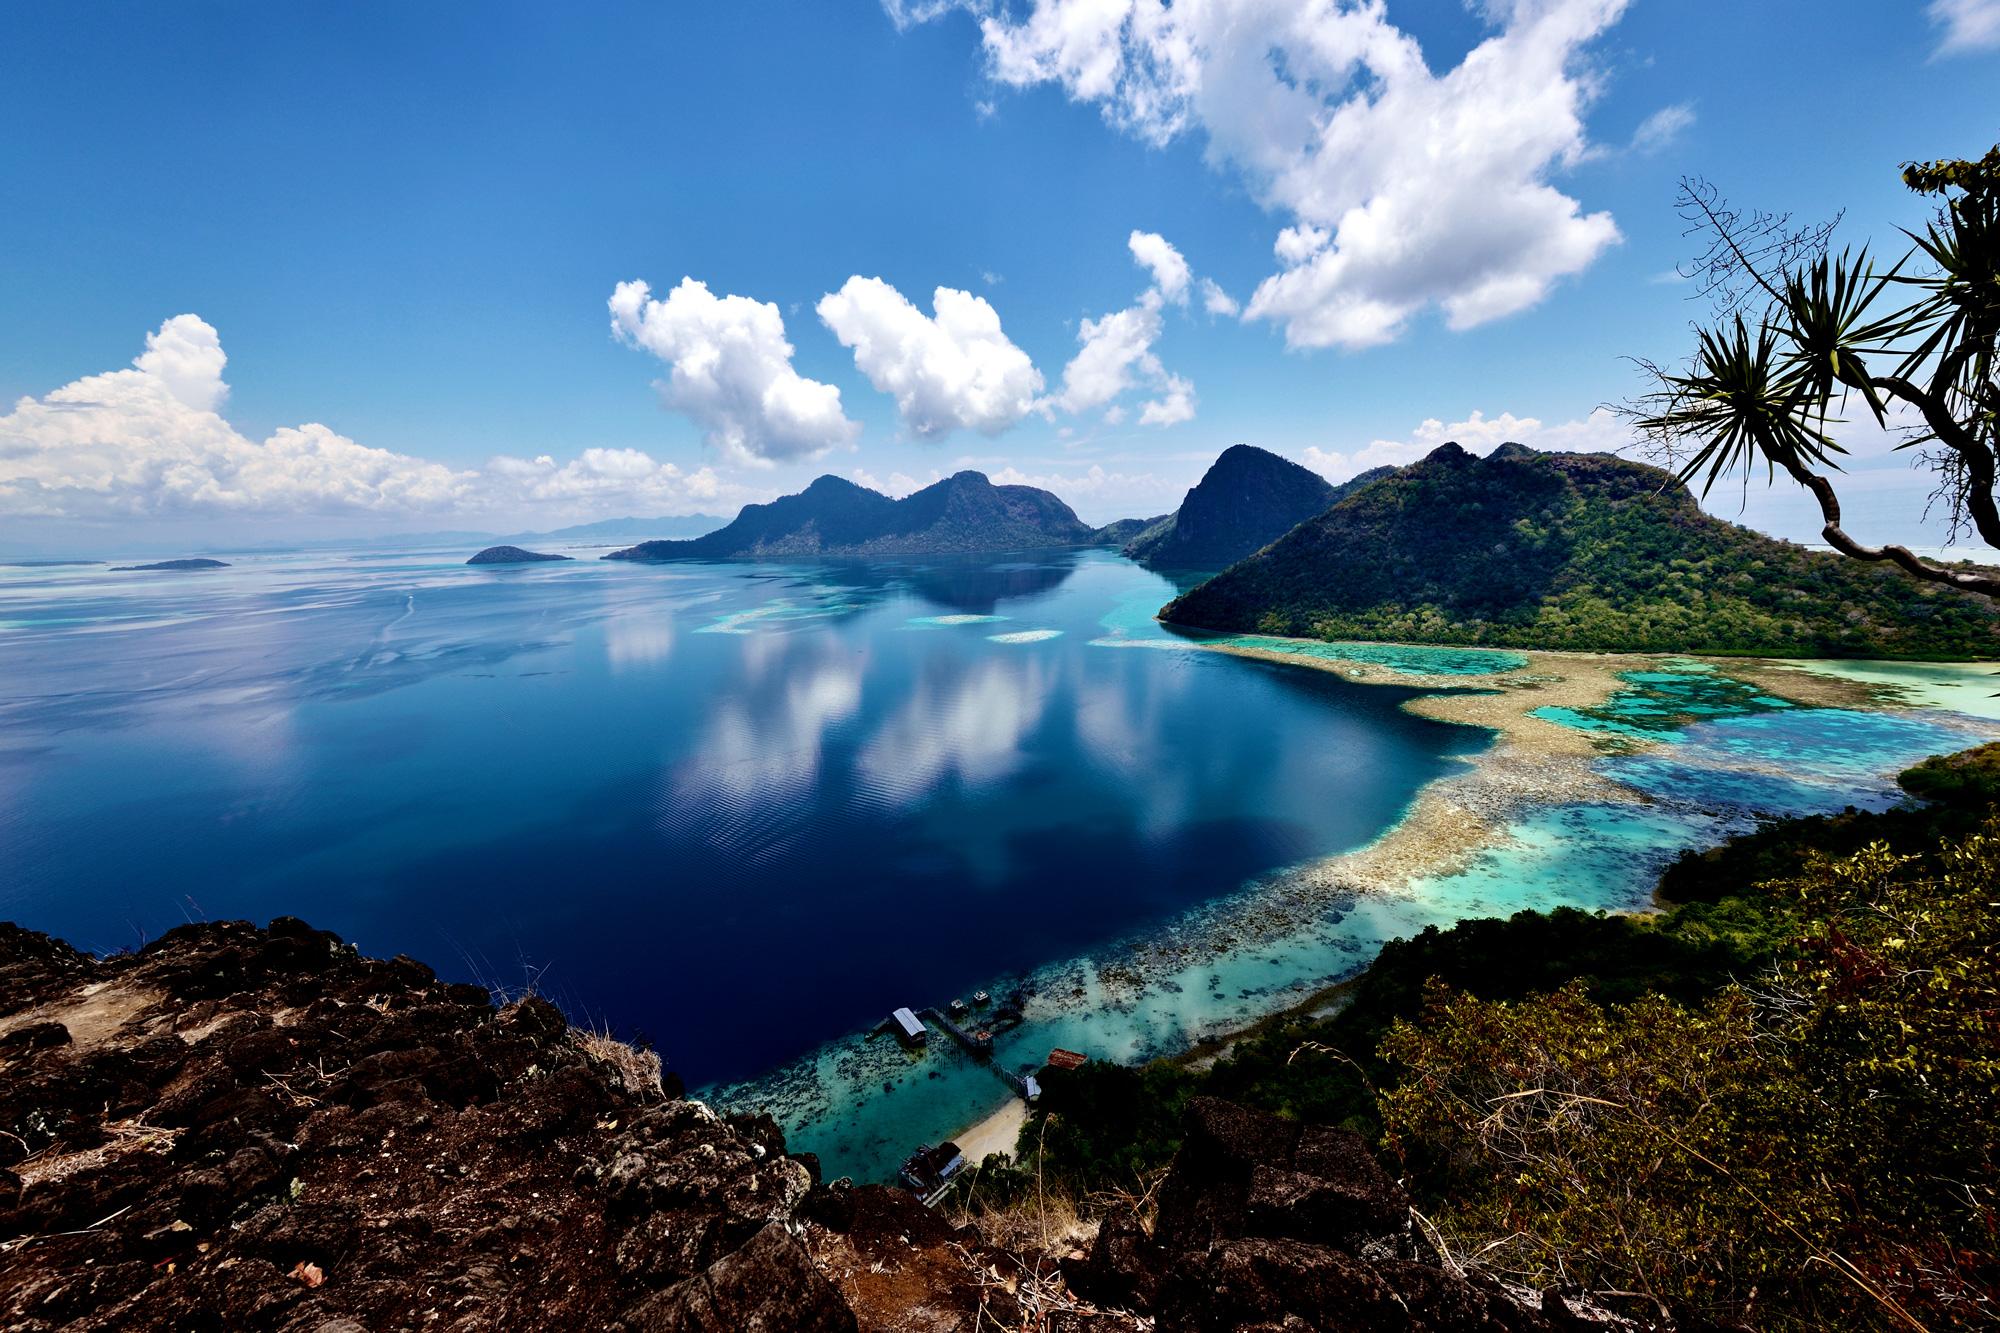 Sipadan islands ren scubaworx - Sipadan dive sites ...